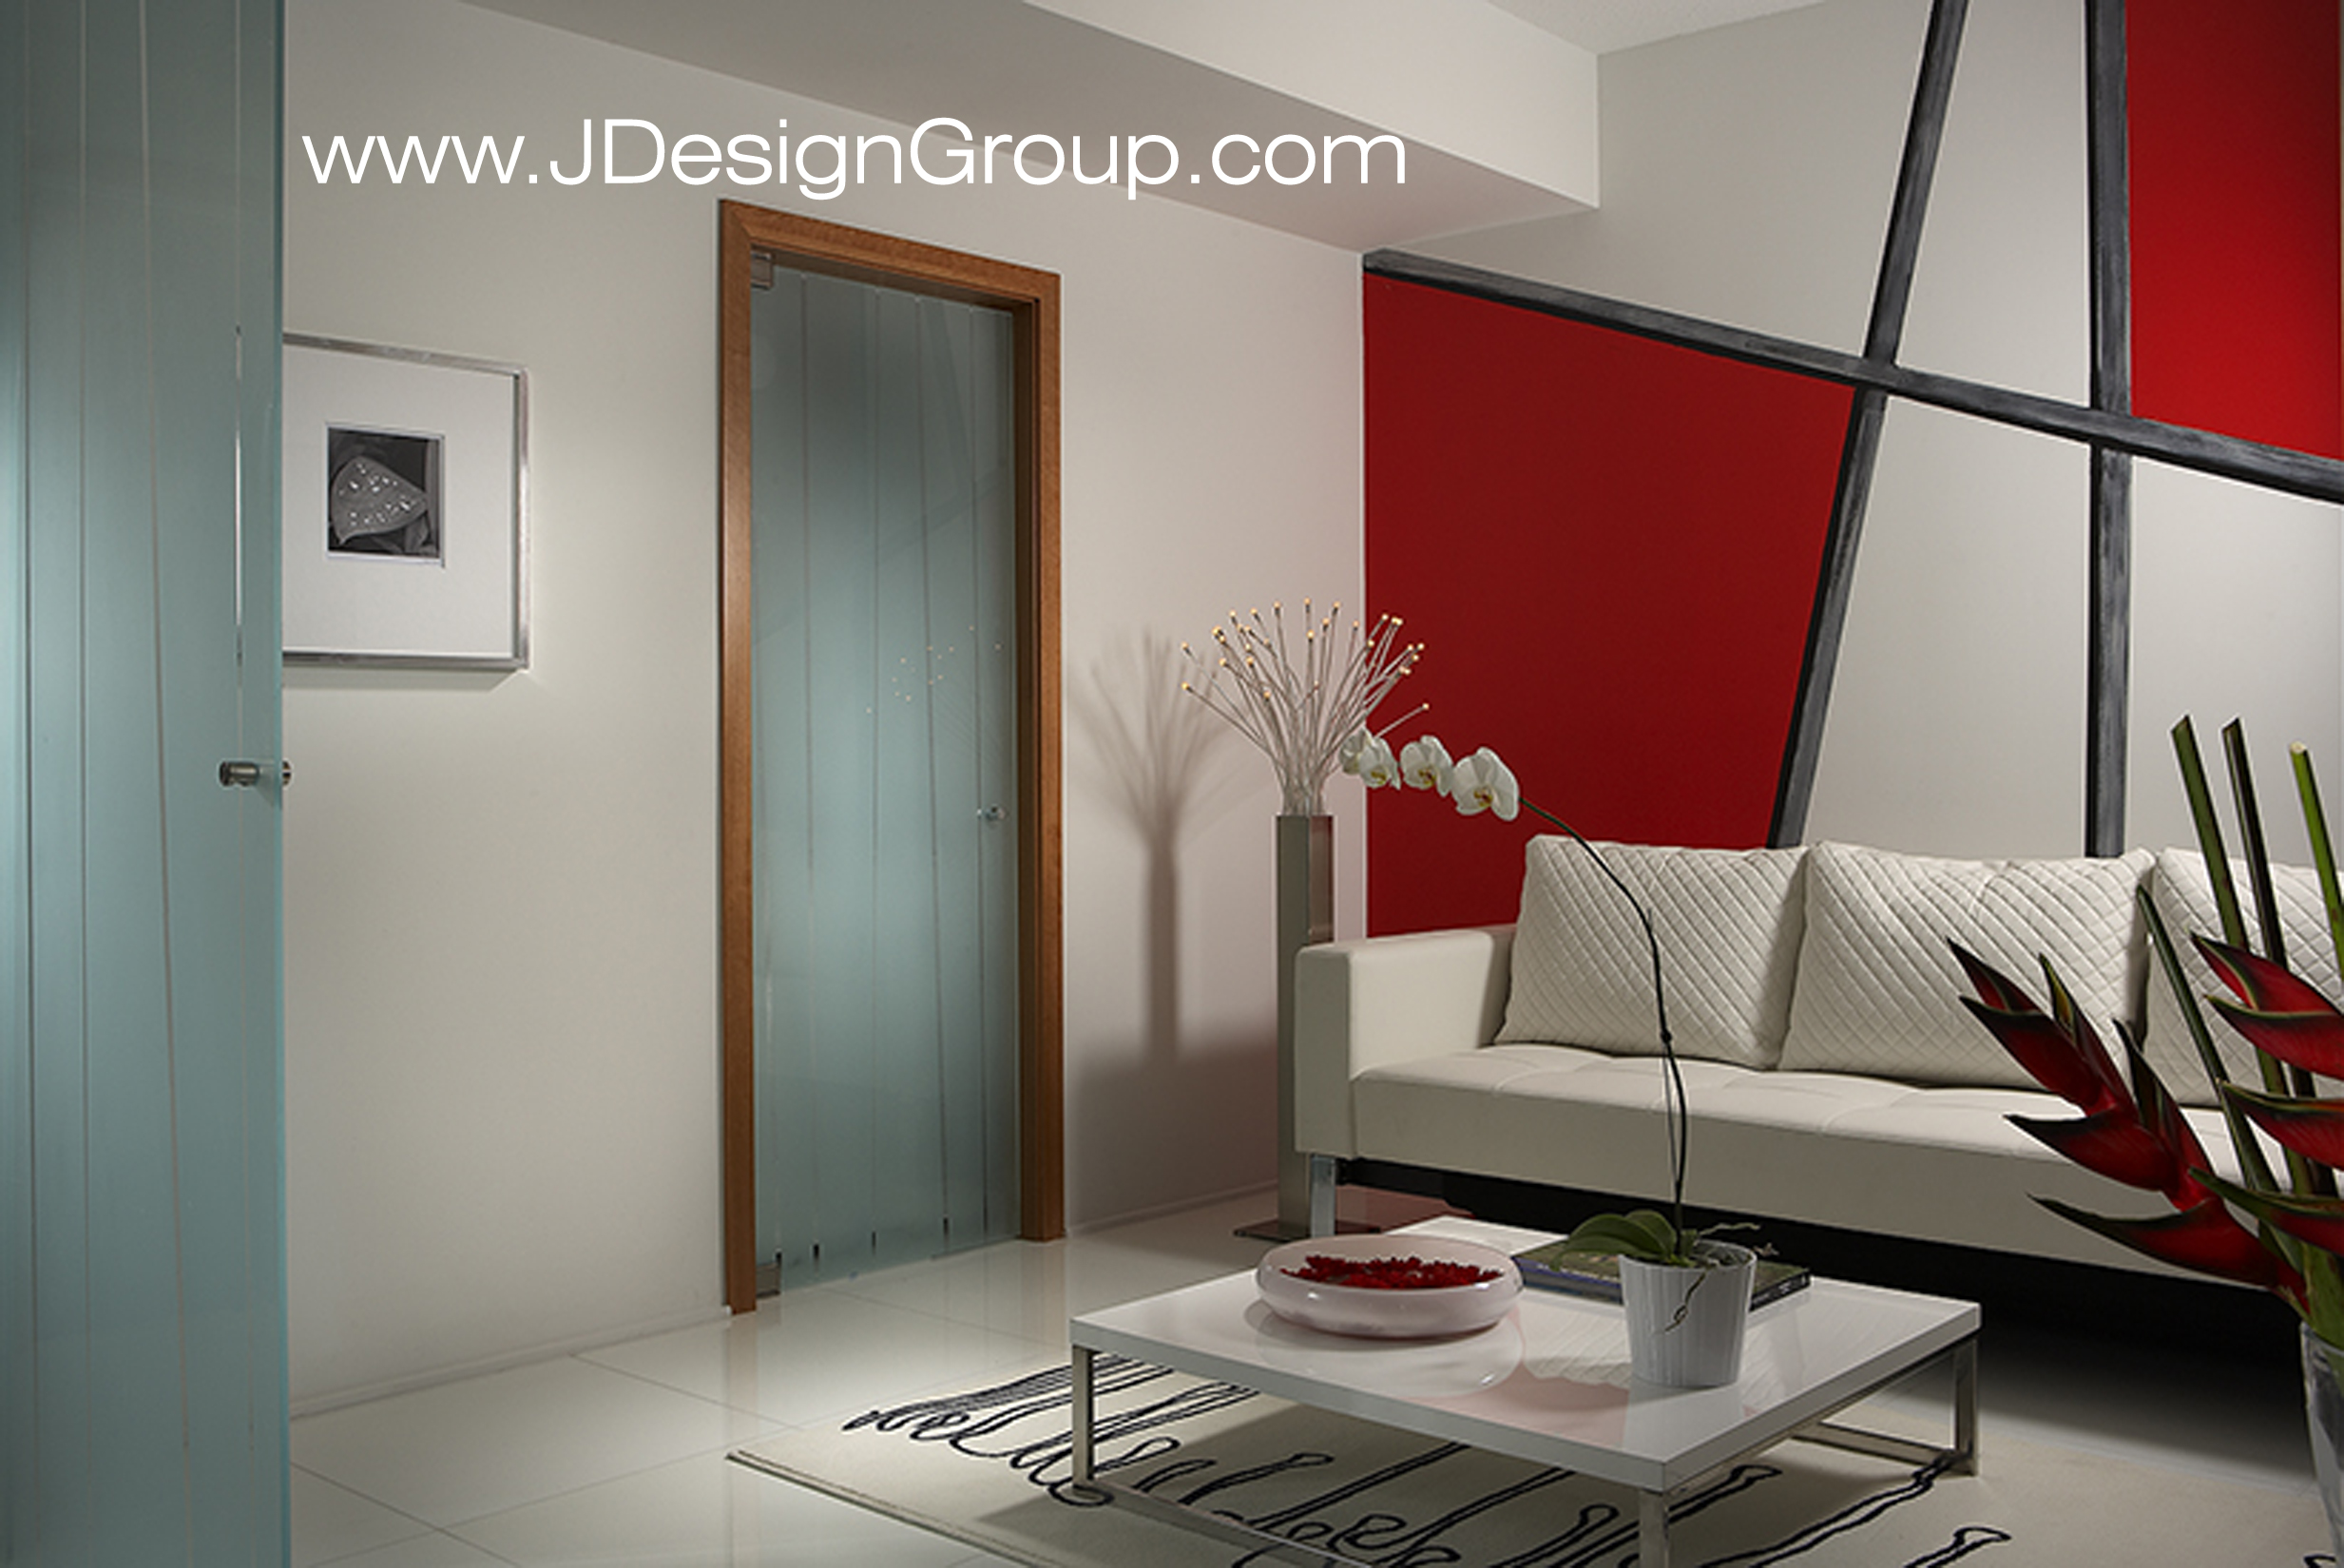 Interior design jobs miami